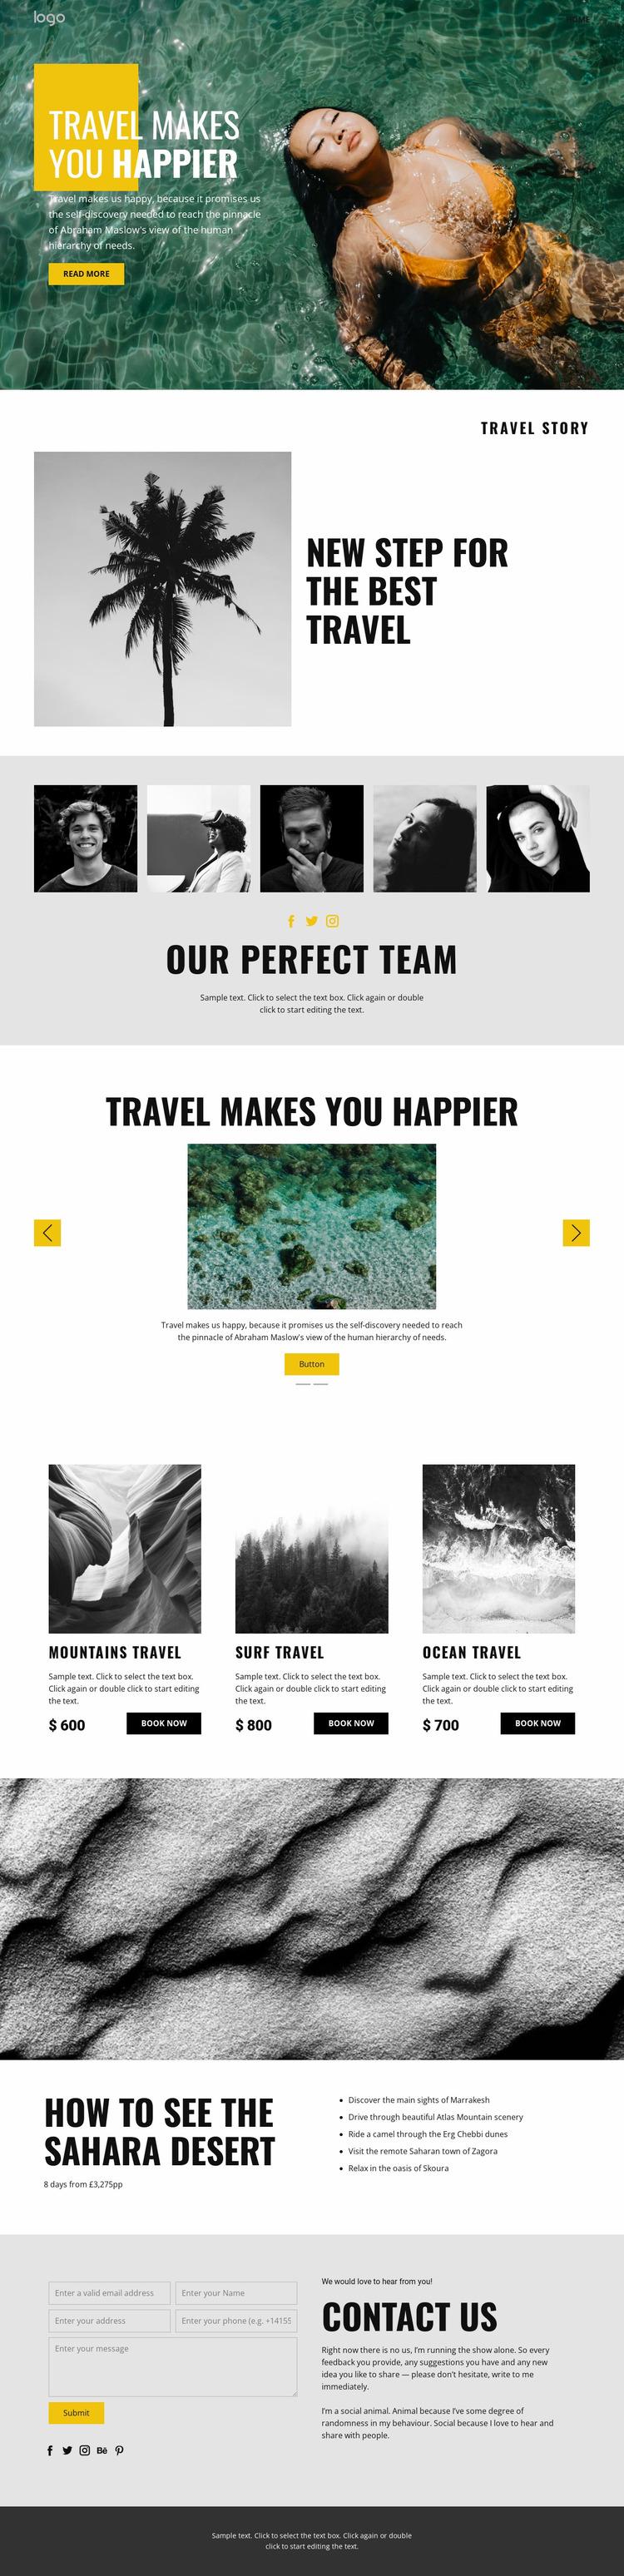 Happy people deserve travel Website Mockup